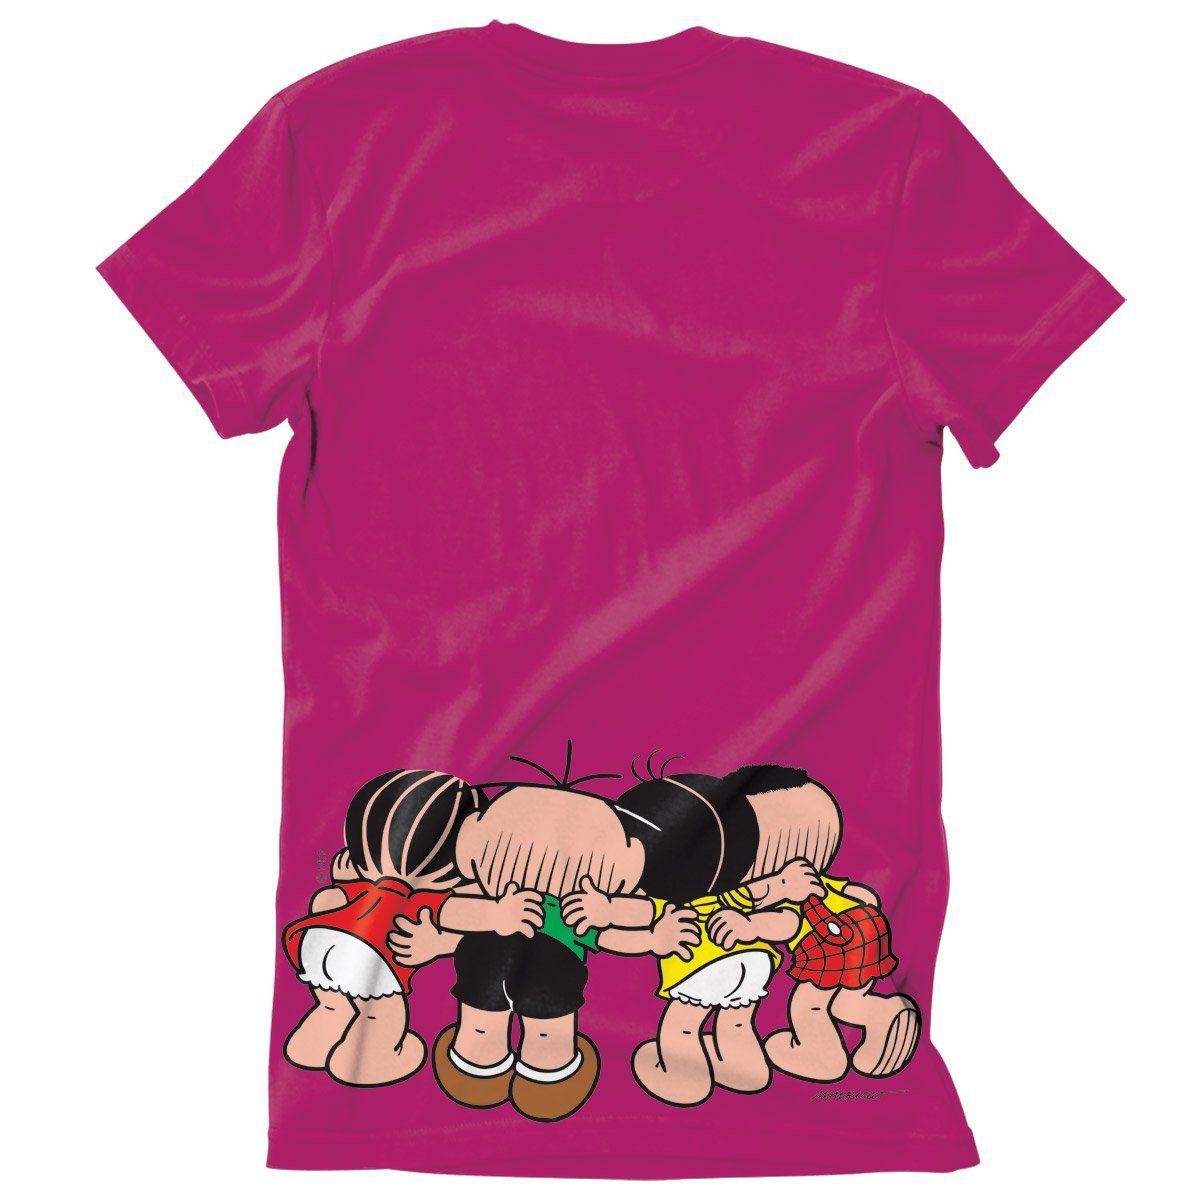 Camiseta Turma Da Mônica Kids Vamos Fazer Um Plano!